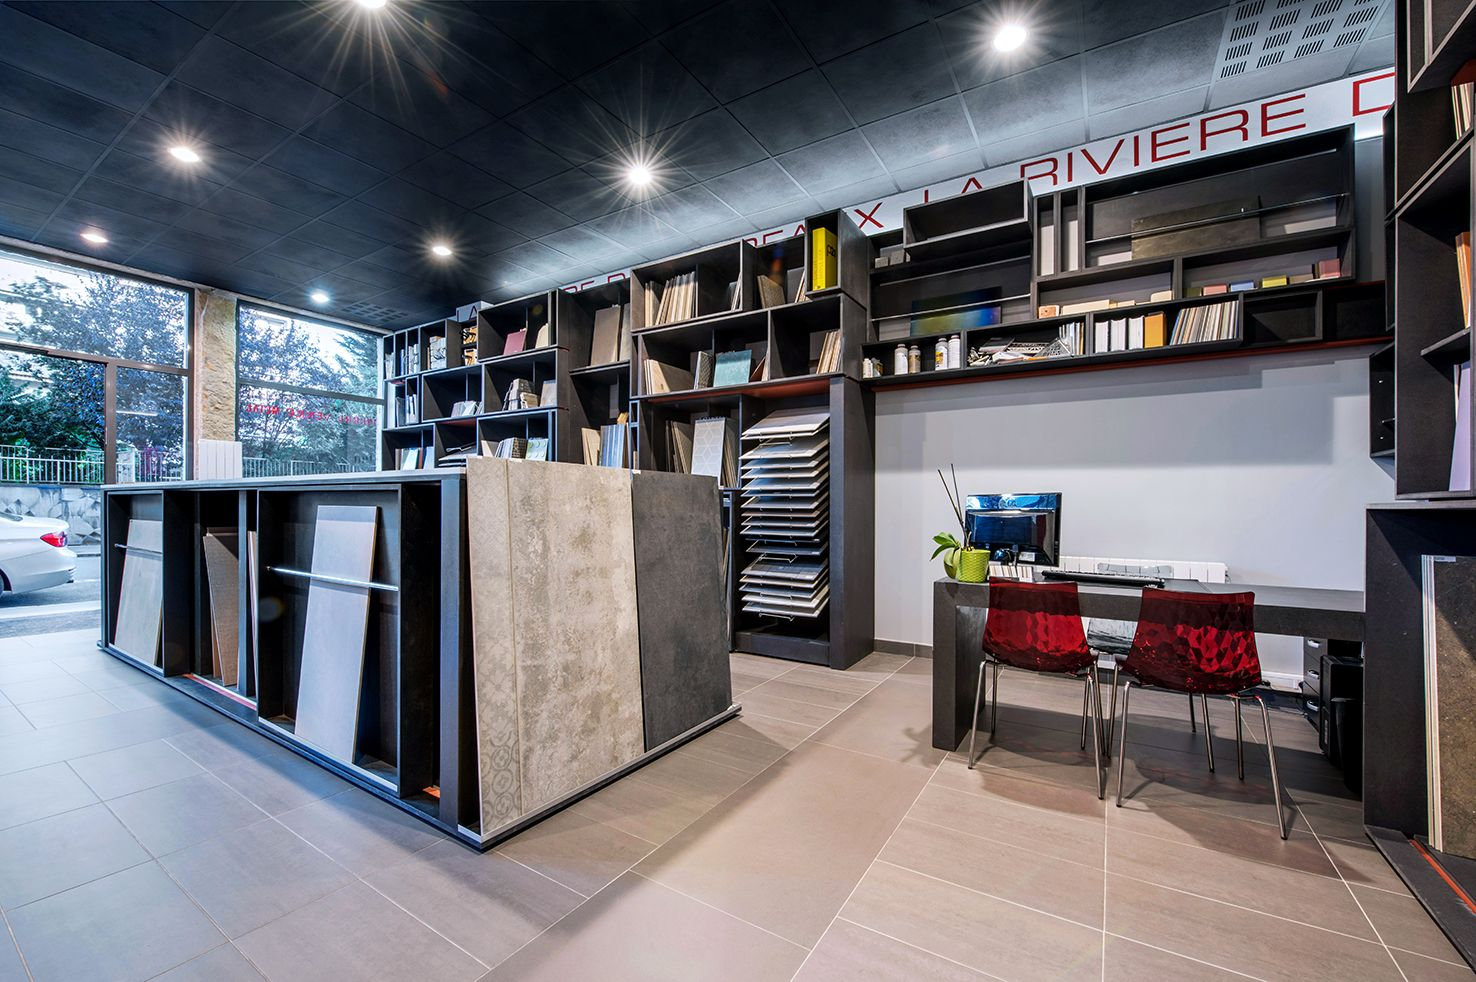 magasin carrelage lyon simple design porcelanosa carrelage mural calais ado phenomenal. Black Bedroom Furniture Sets. Home Design Ideas